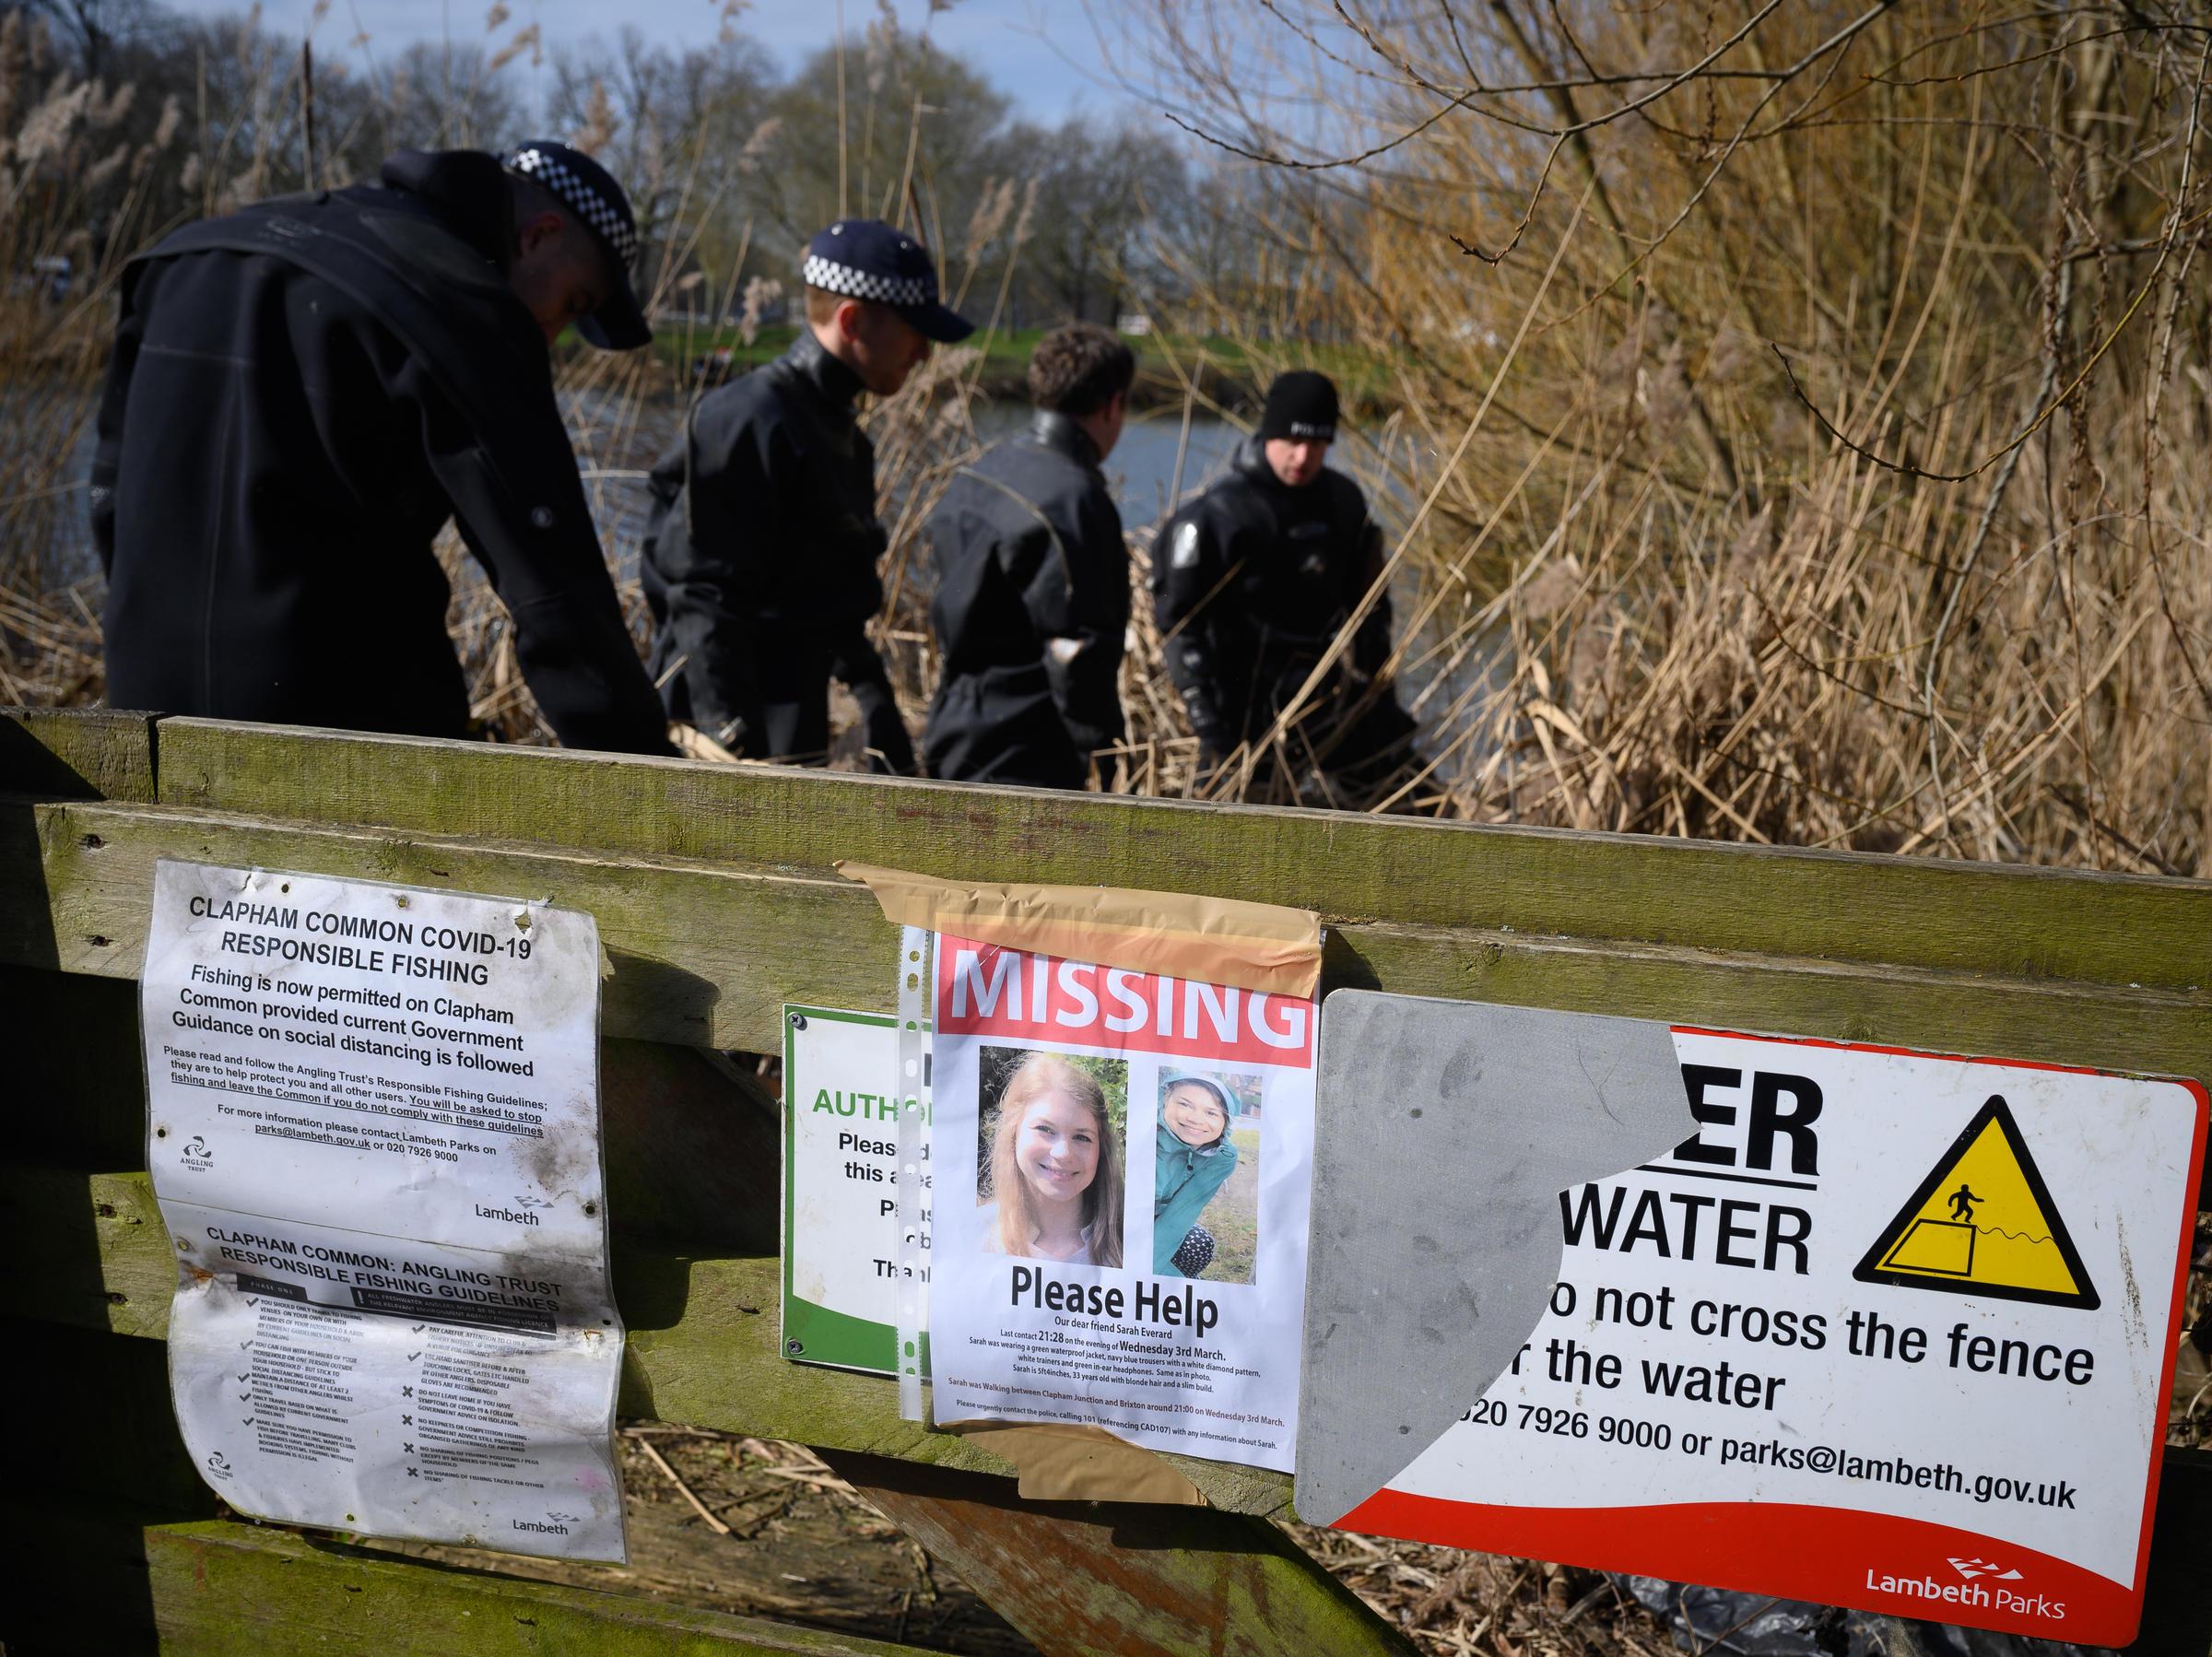 London vigil organised following disappearance of Sarah Everard